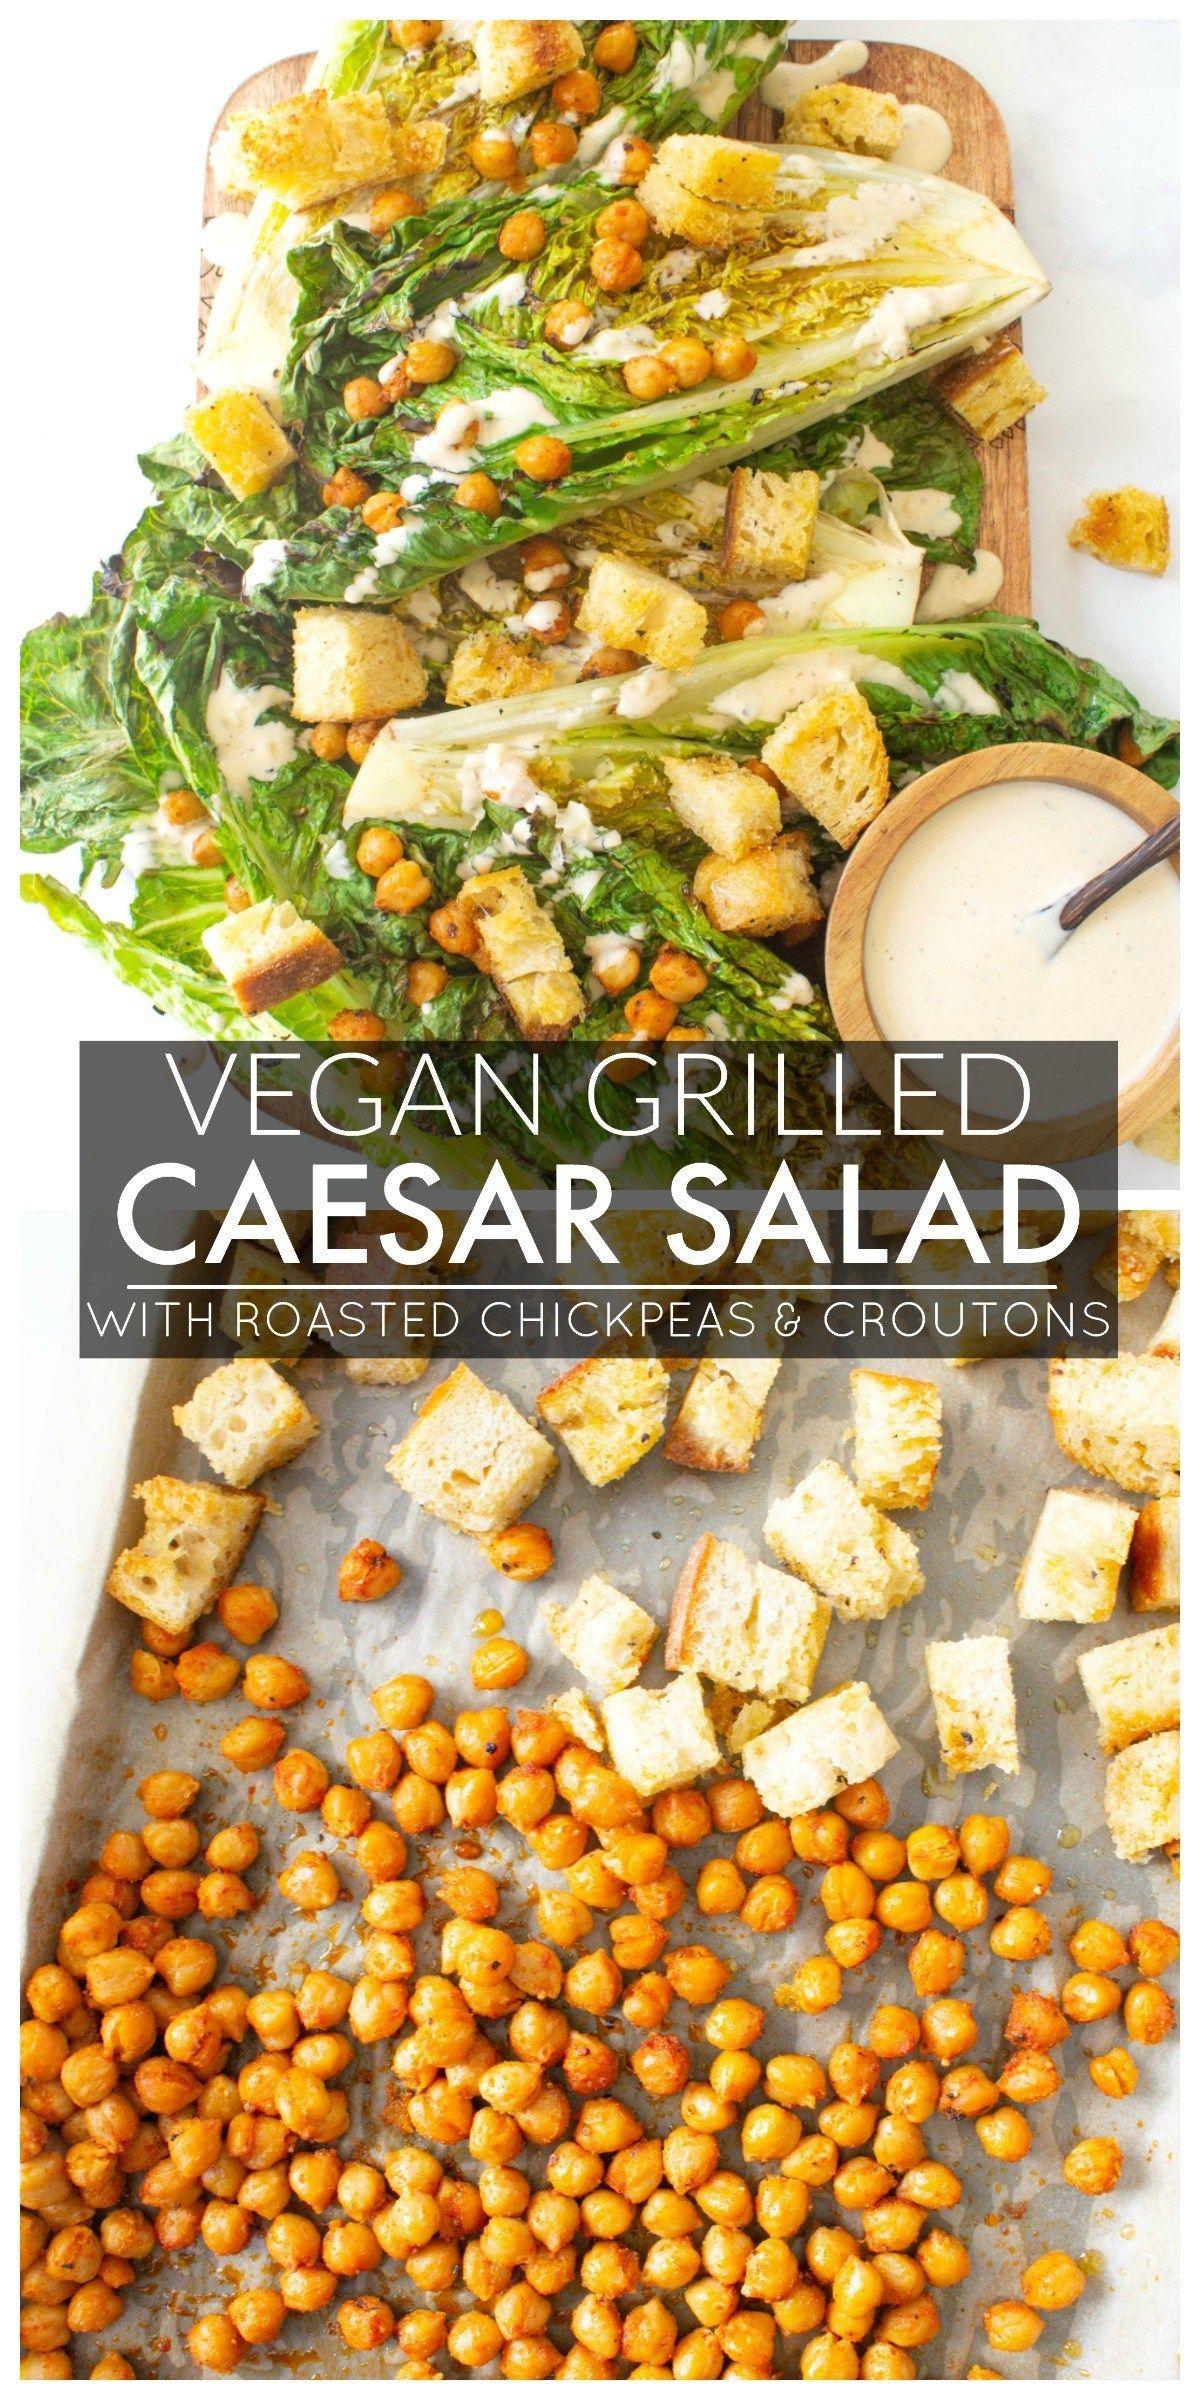 Vegan Grilled Caesar Salad